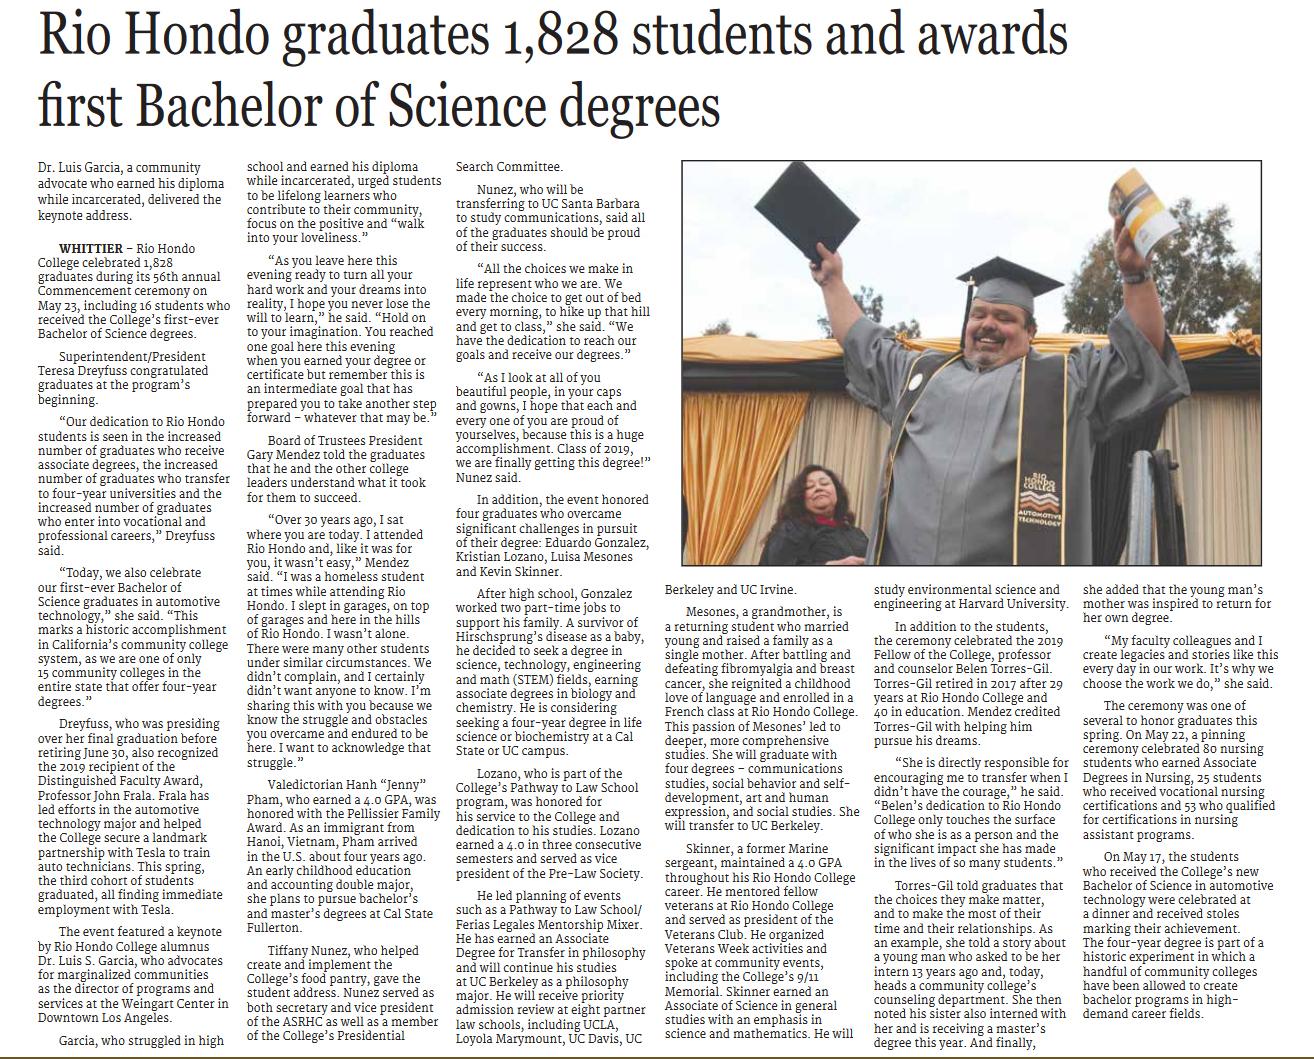 Norwalk Patriot covers RHC graduation 2019